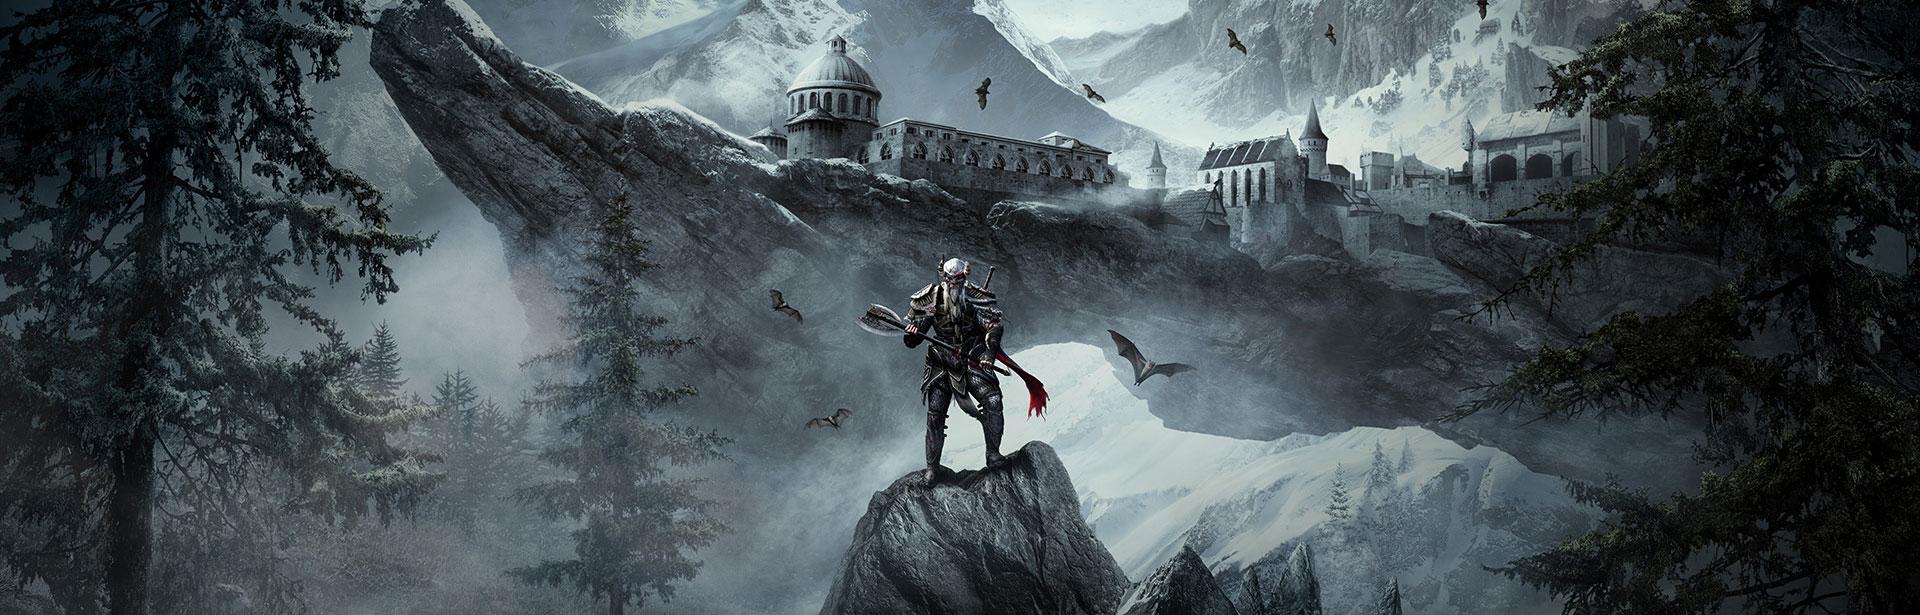 Elder Scrolls Online: Greymoor Game Guide header